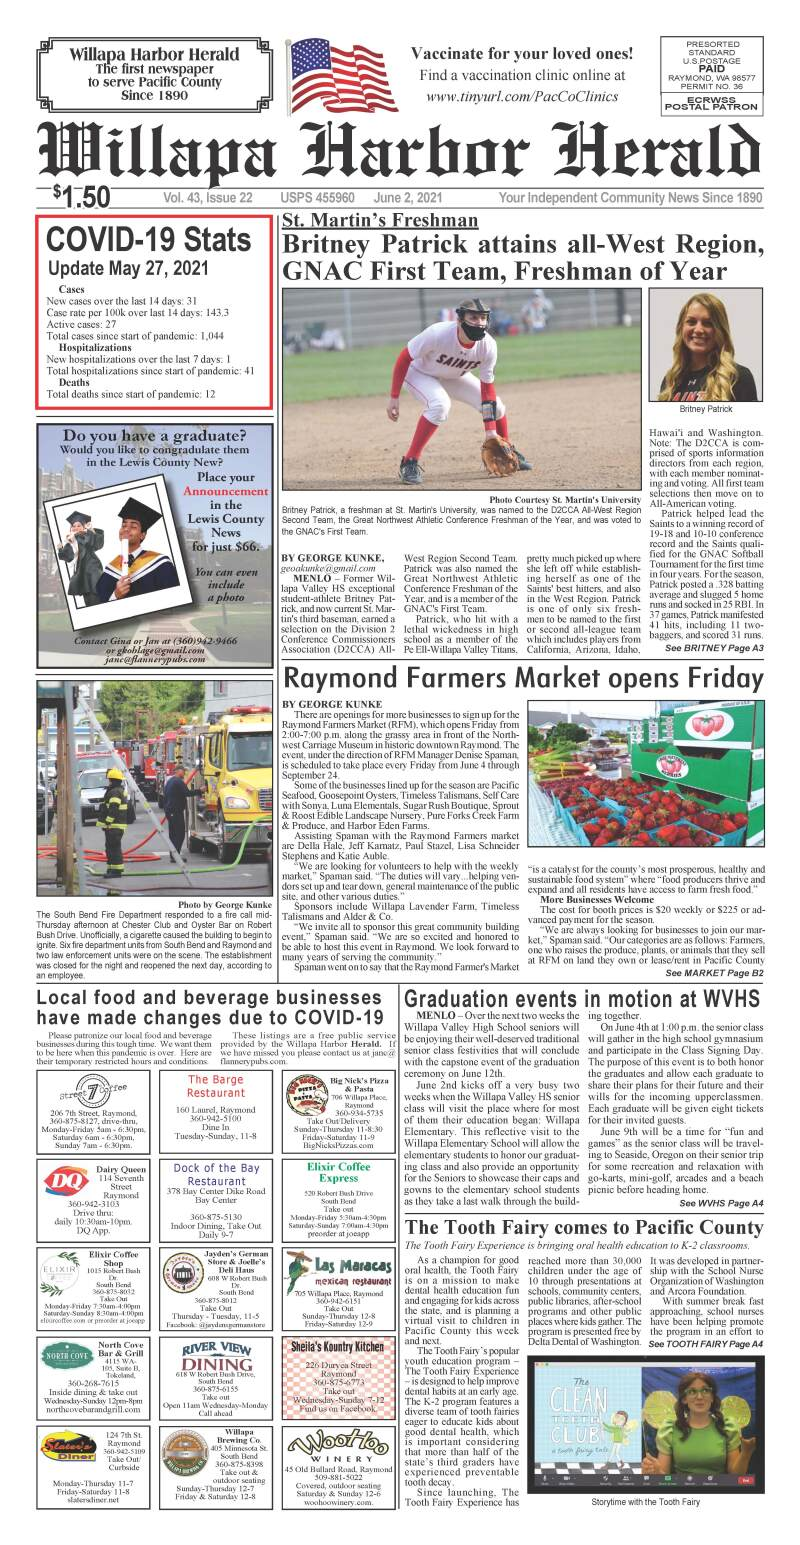 June 2, 2021 Willapa Harbor Herald and Pacific County Press